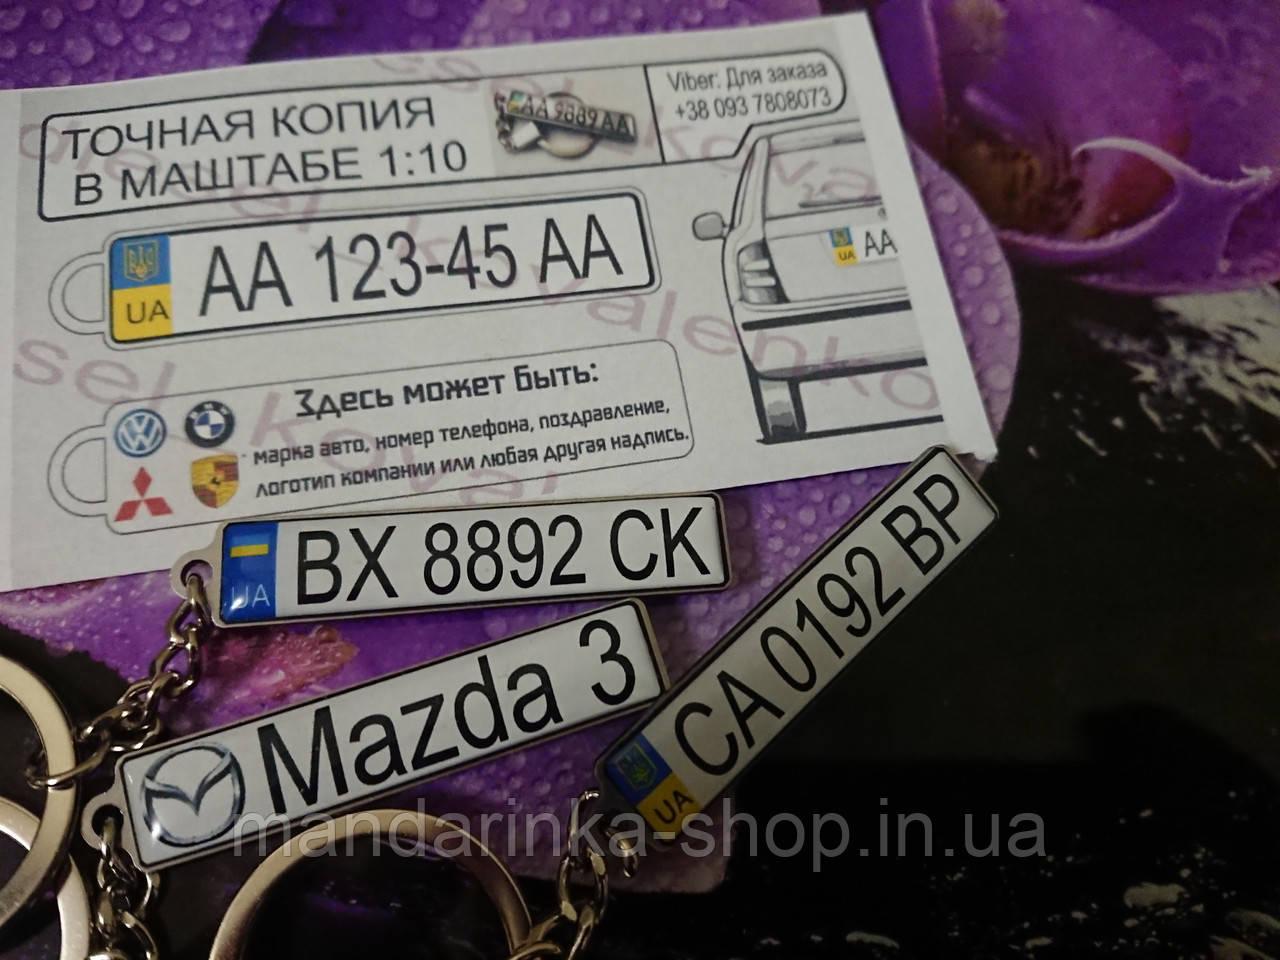 Брелок с номером (Стандарт L) - Mazda 3